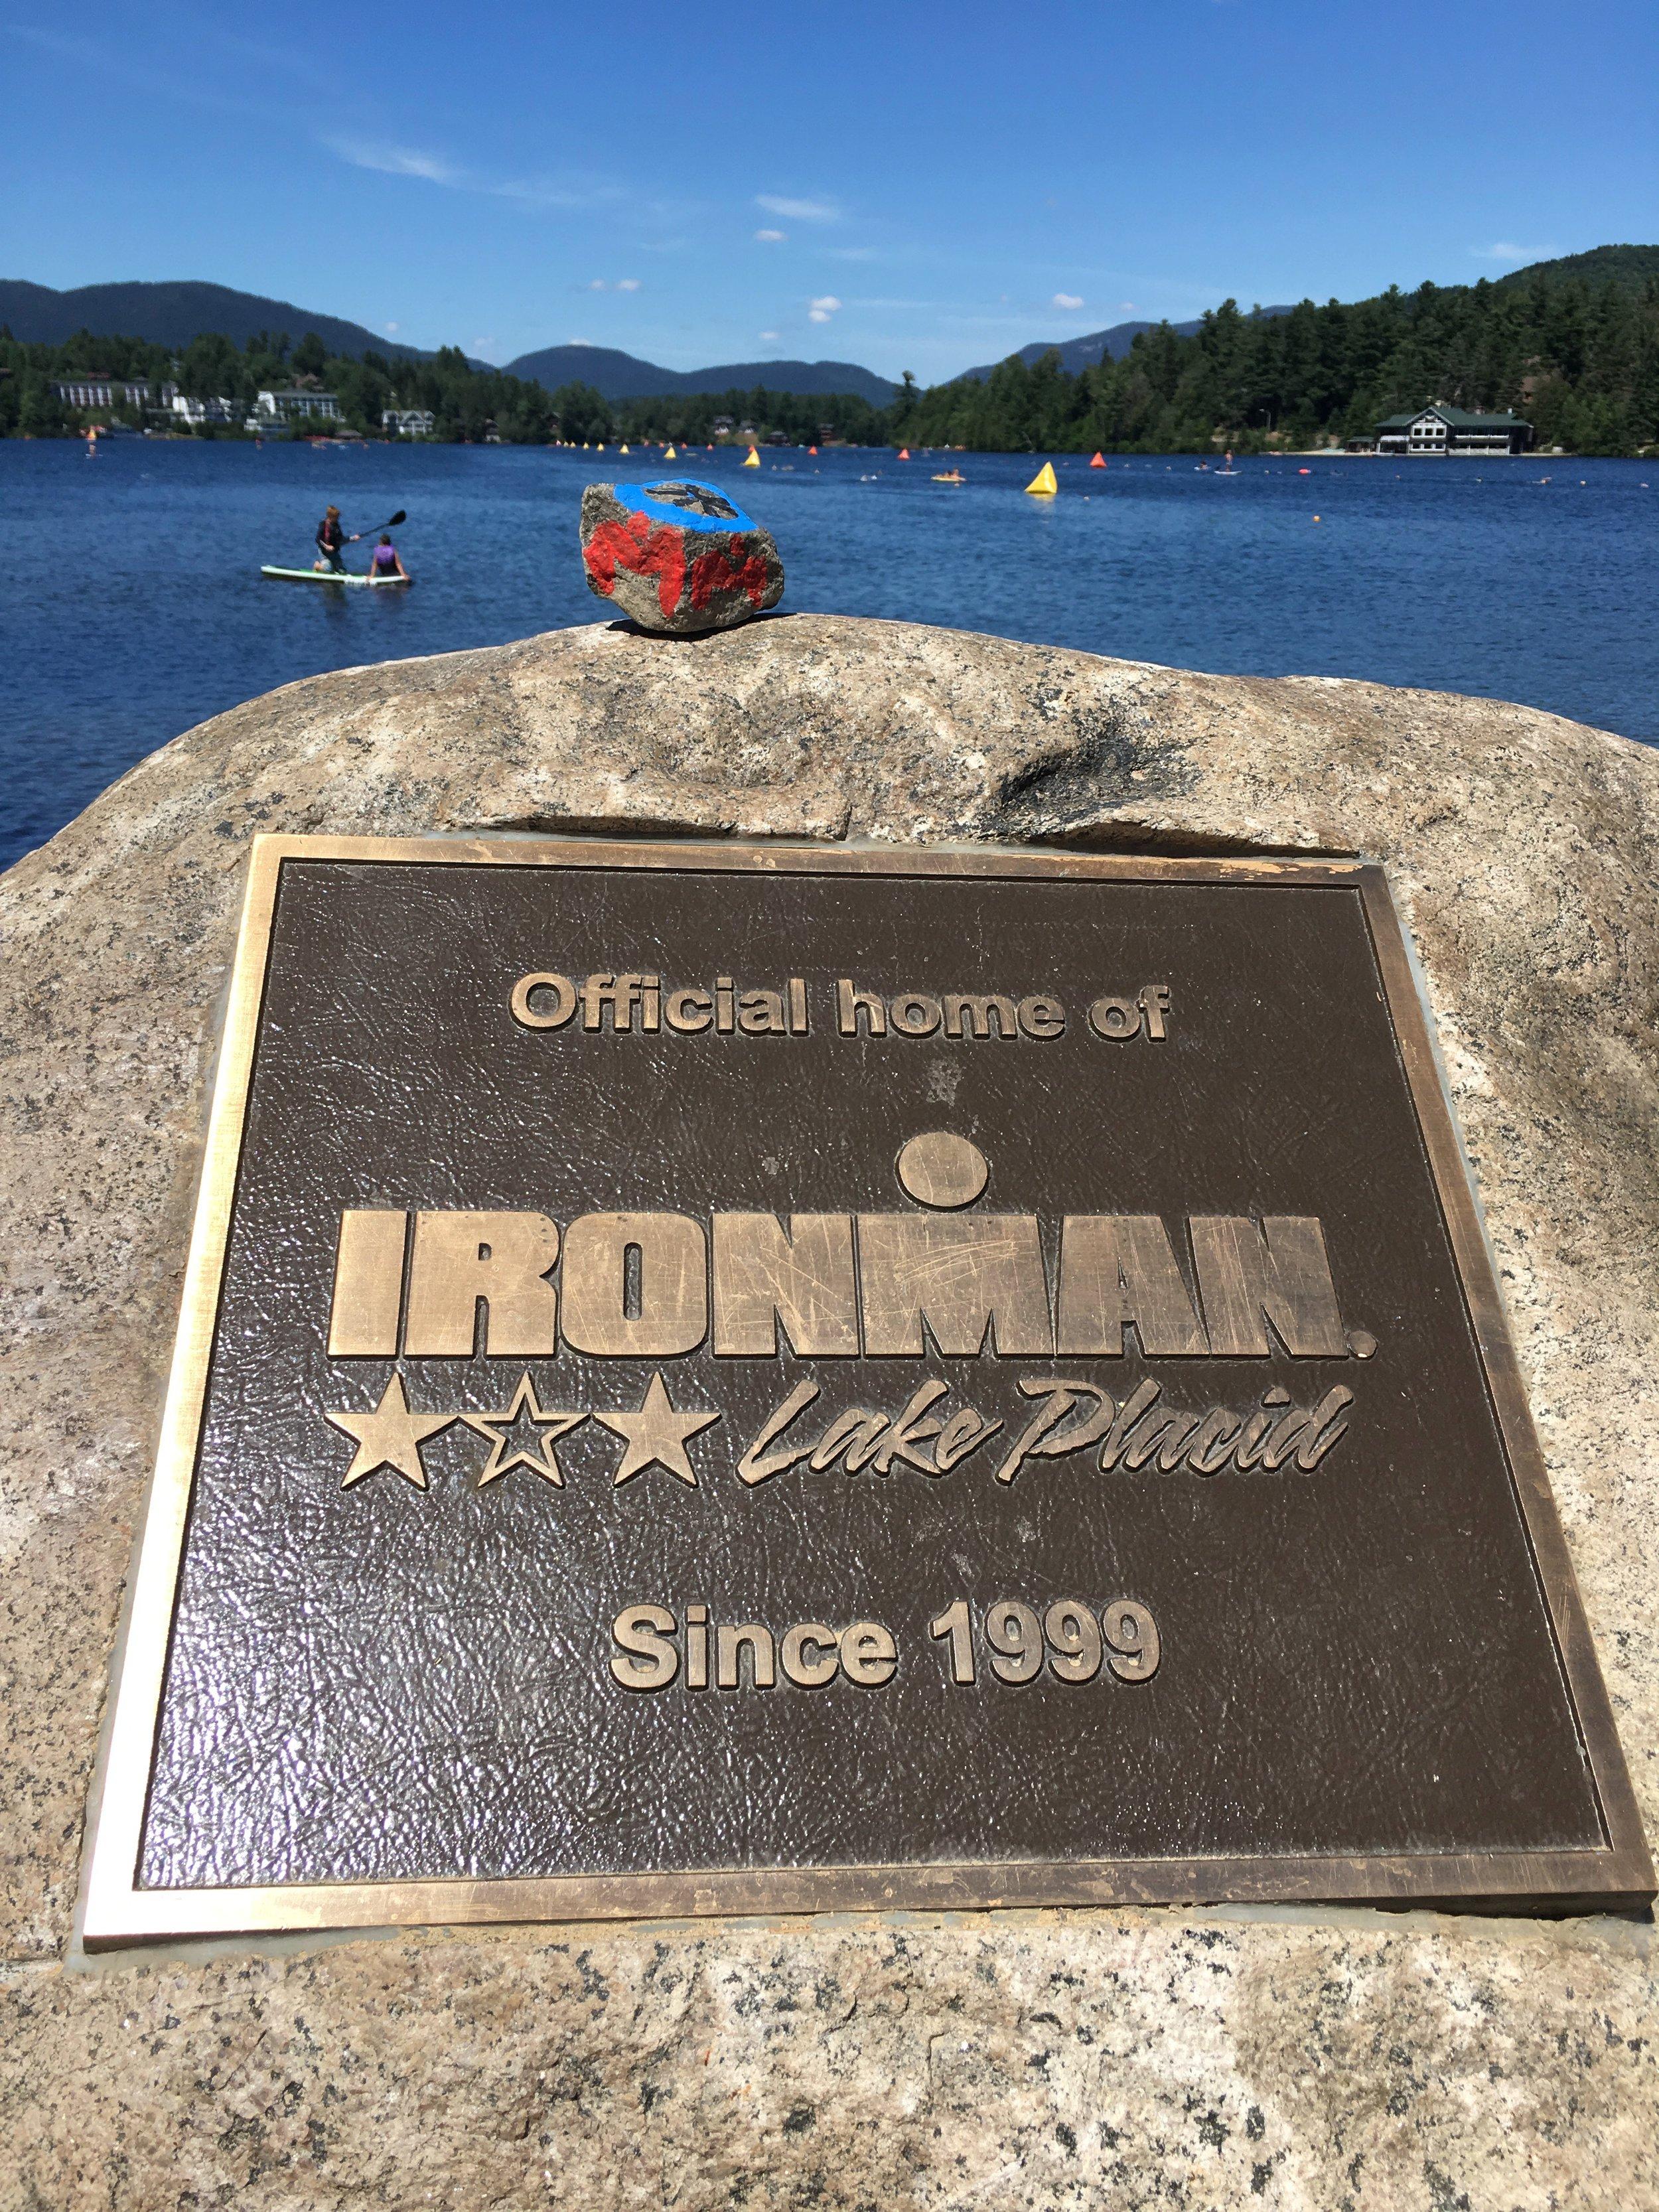 IRONMAN Lake Placid plaque at swim start